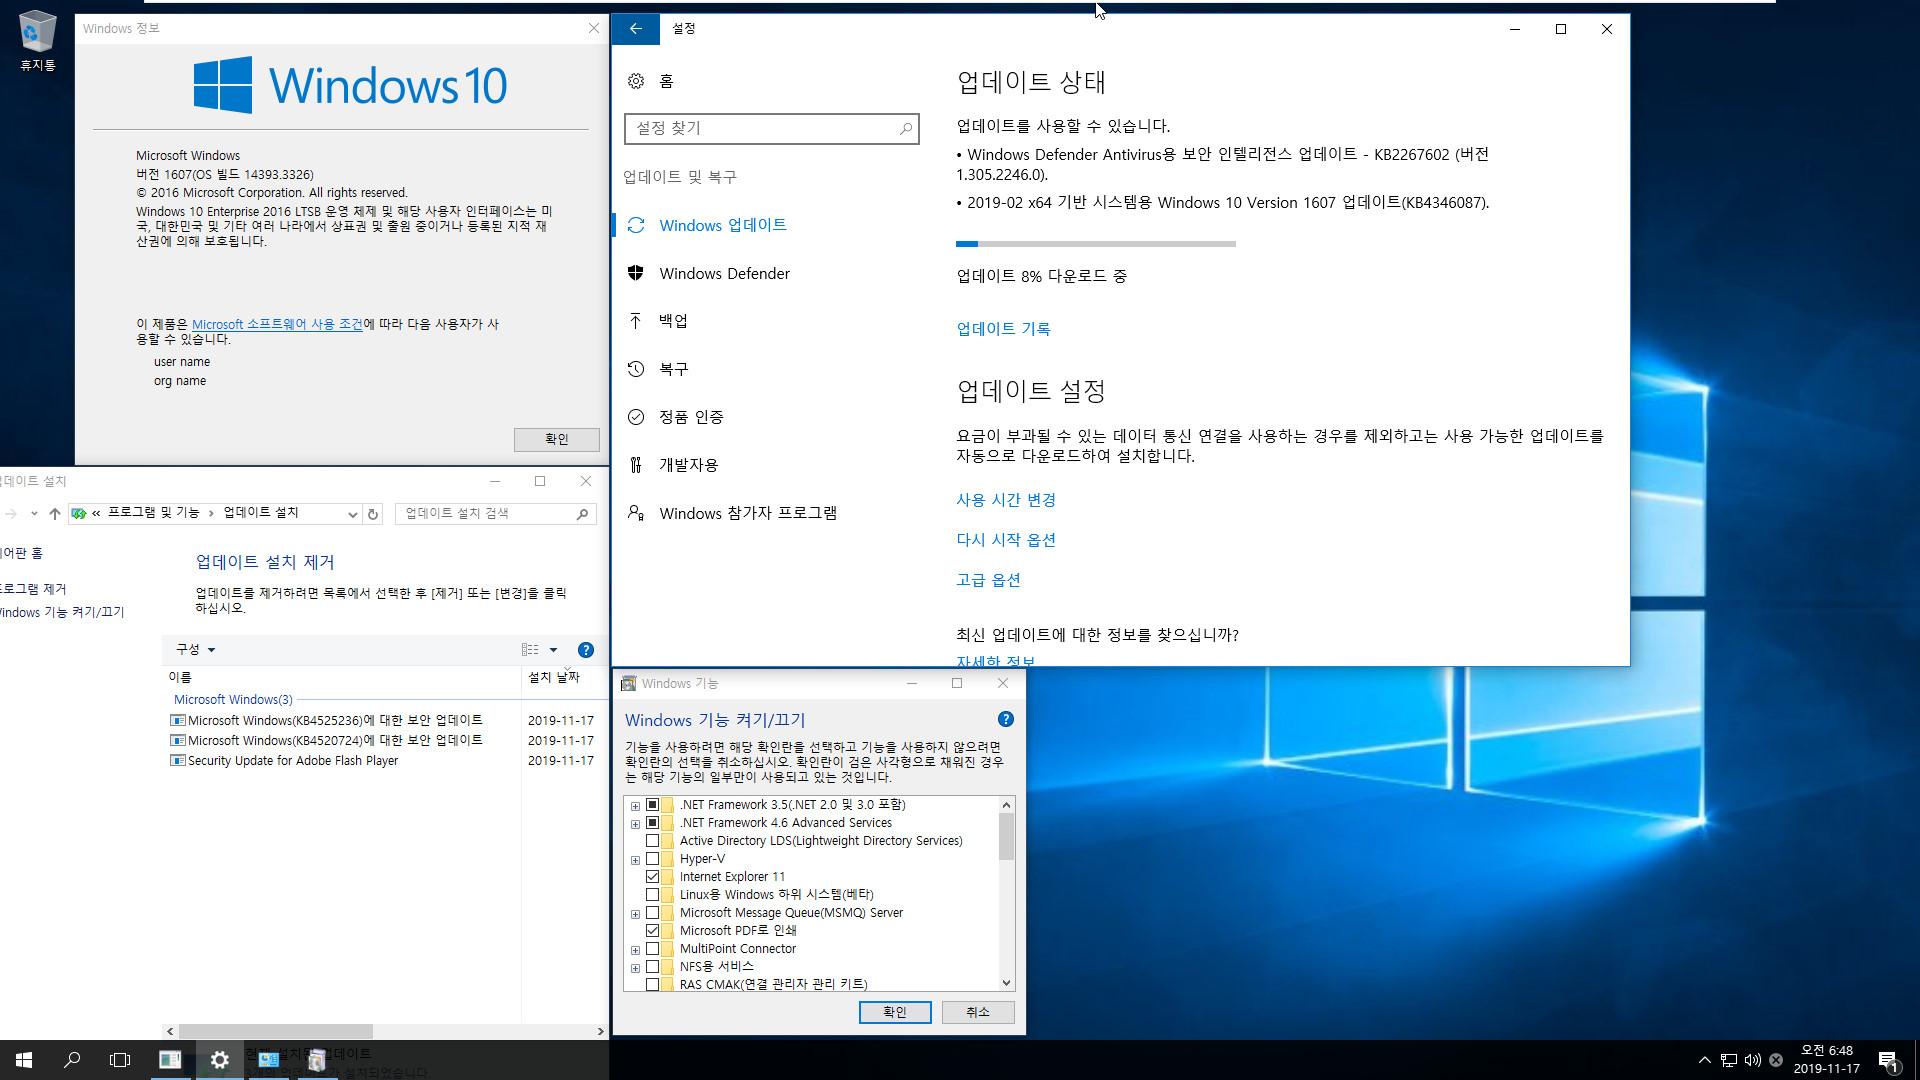 Windows 10 버전 1607 누적 업데이트 KB4525236 (OS 빌드 14393.3326) [2019-11-12 일자] 중에 2016 LTSB 통합중 입니다 - 64비트 확인 2019-11-17_064857.jpg